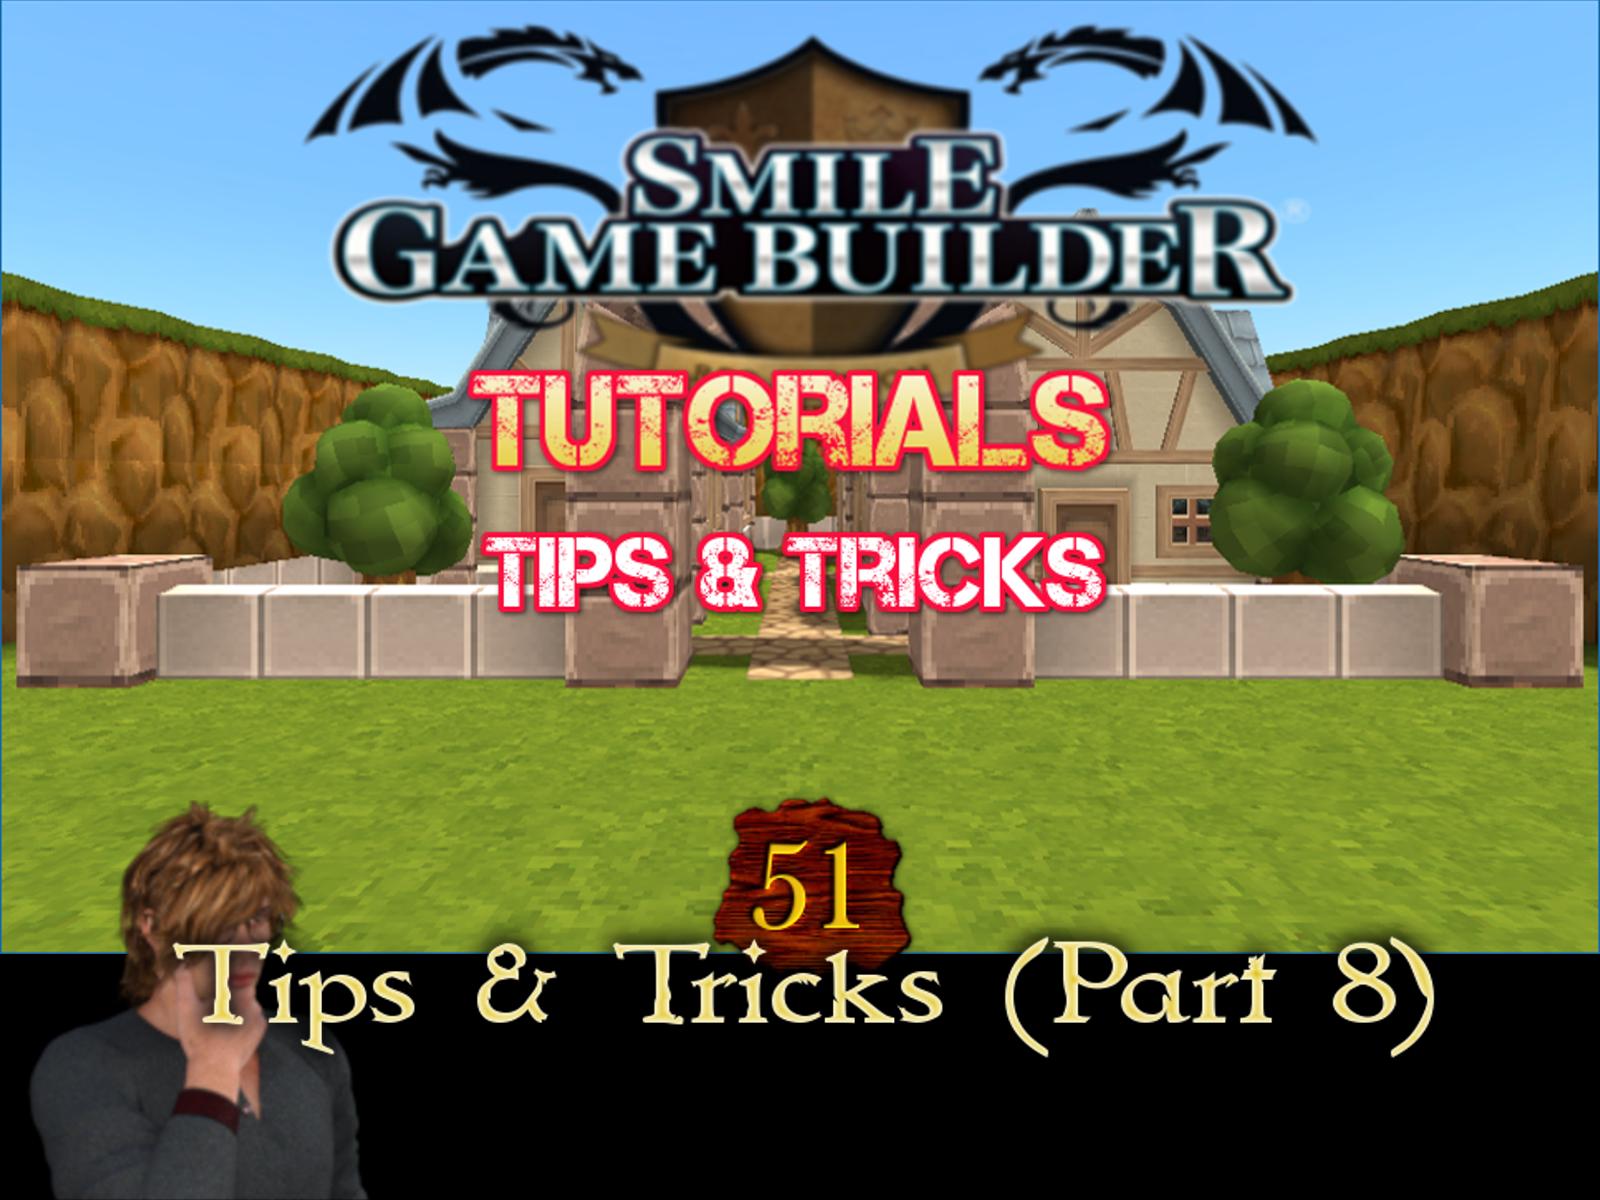 Smile Game Builder Tutorial 51 - Tips & Tricks (Part 8)